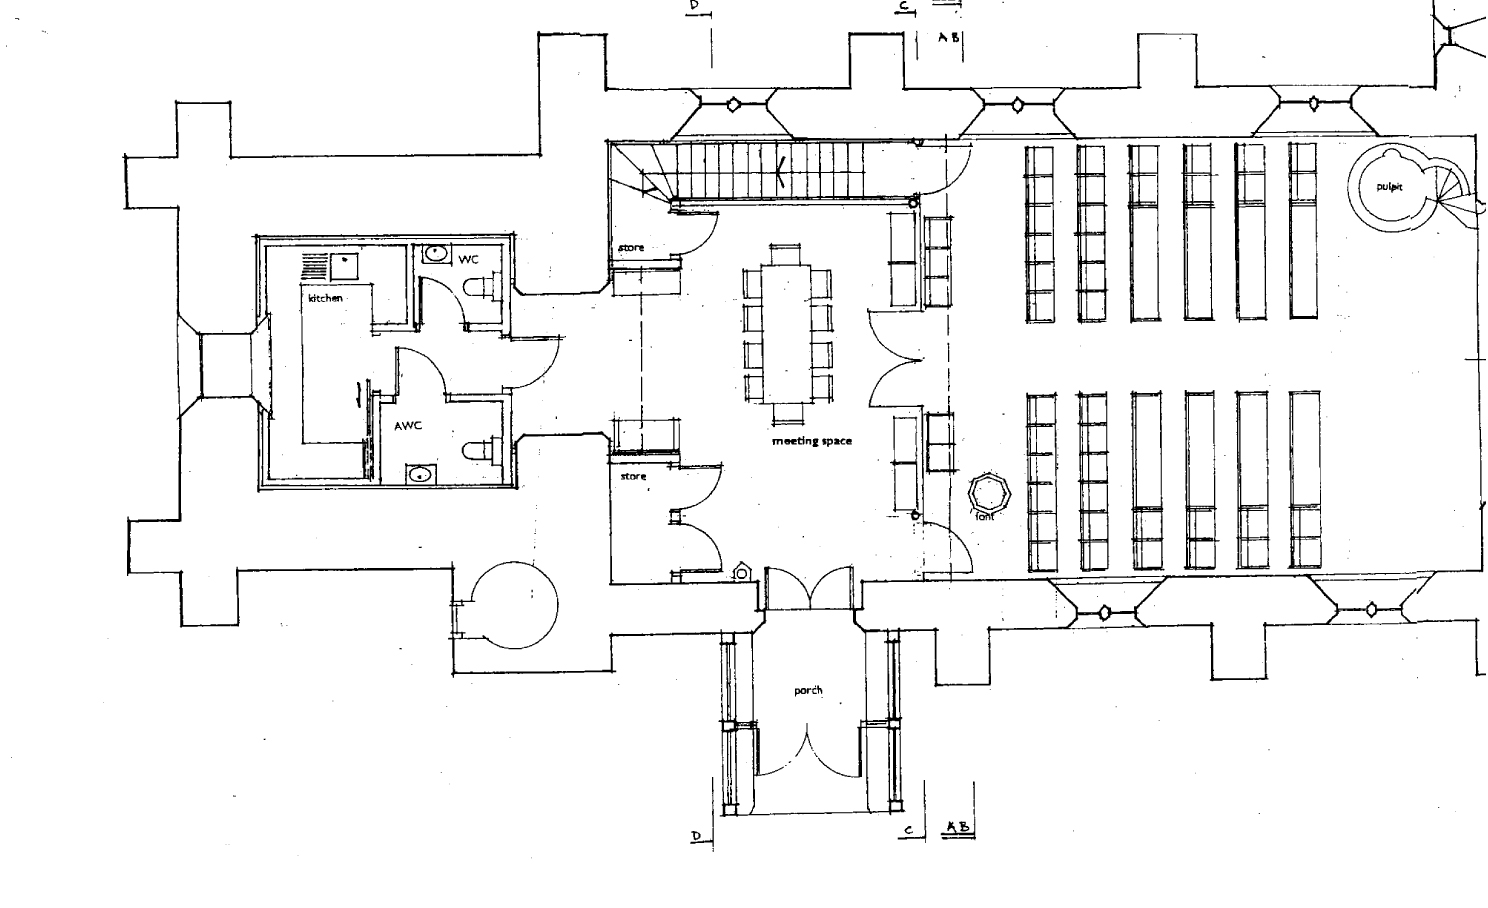 architects-plans-kitchen-plan-sept-2015